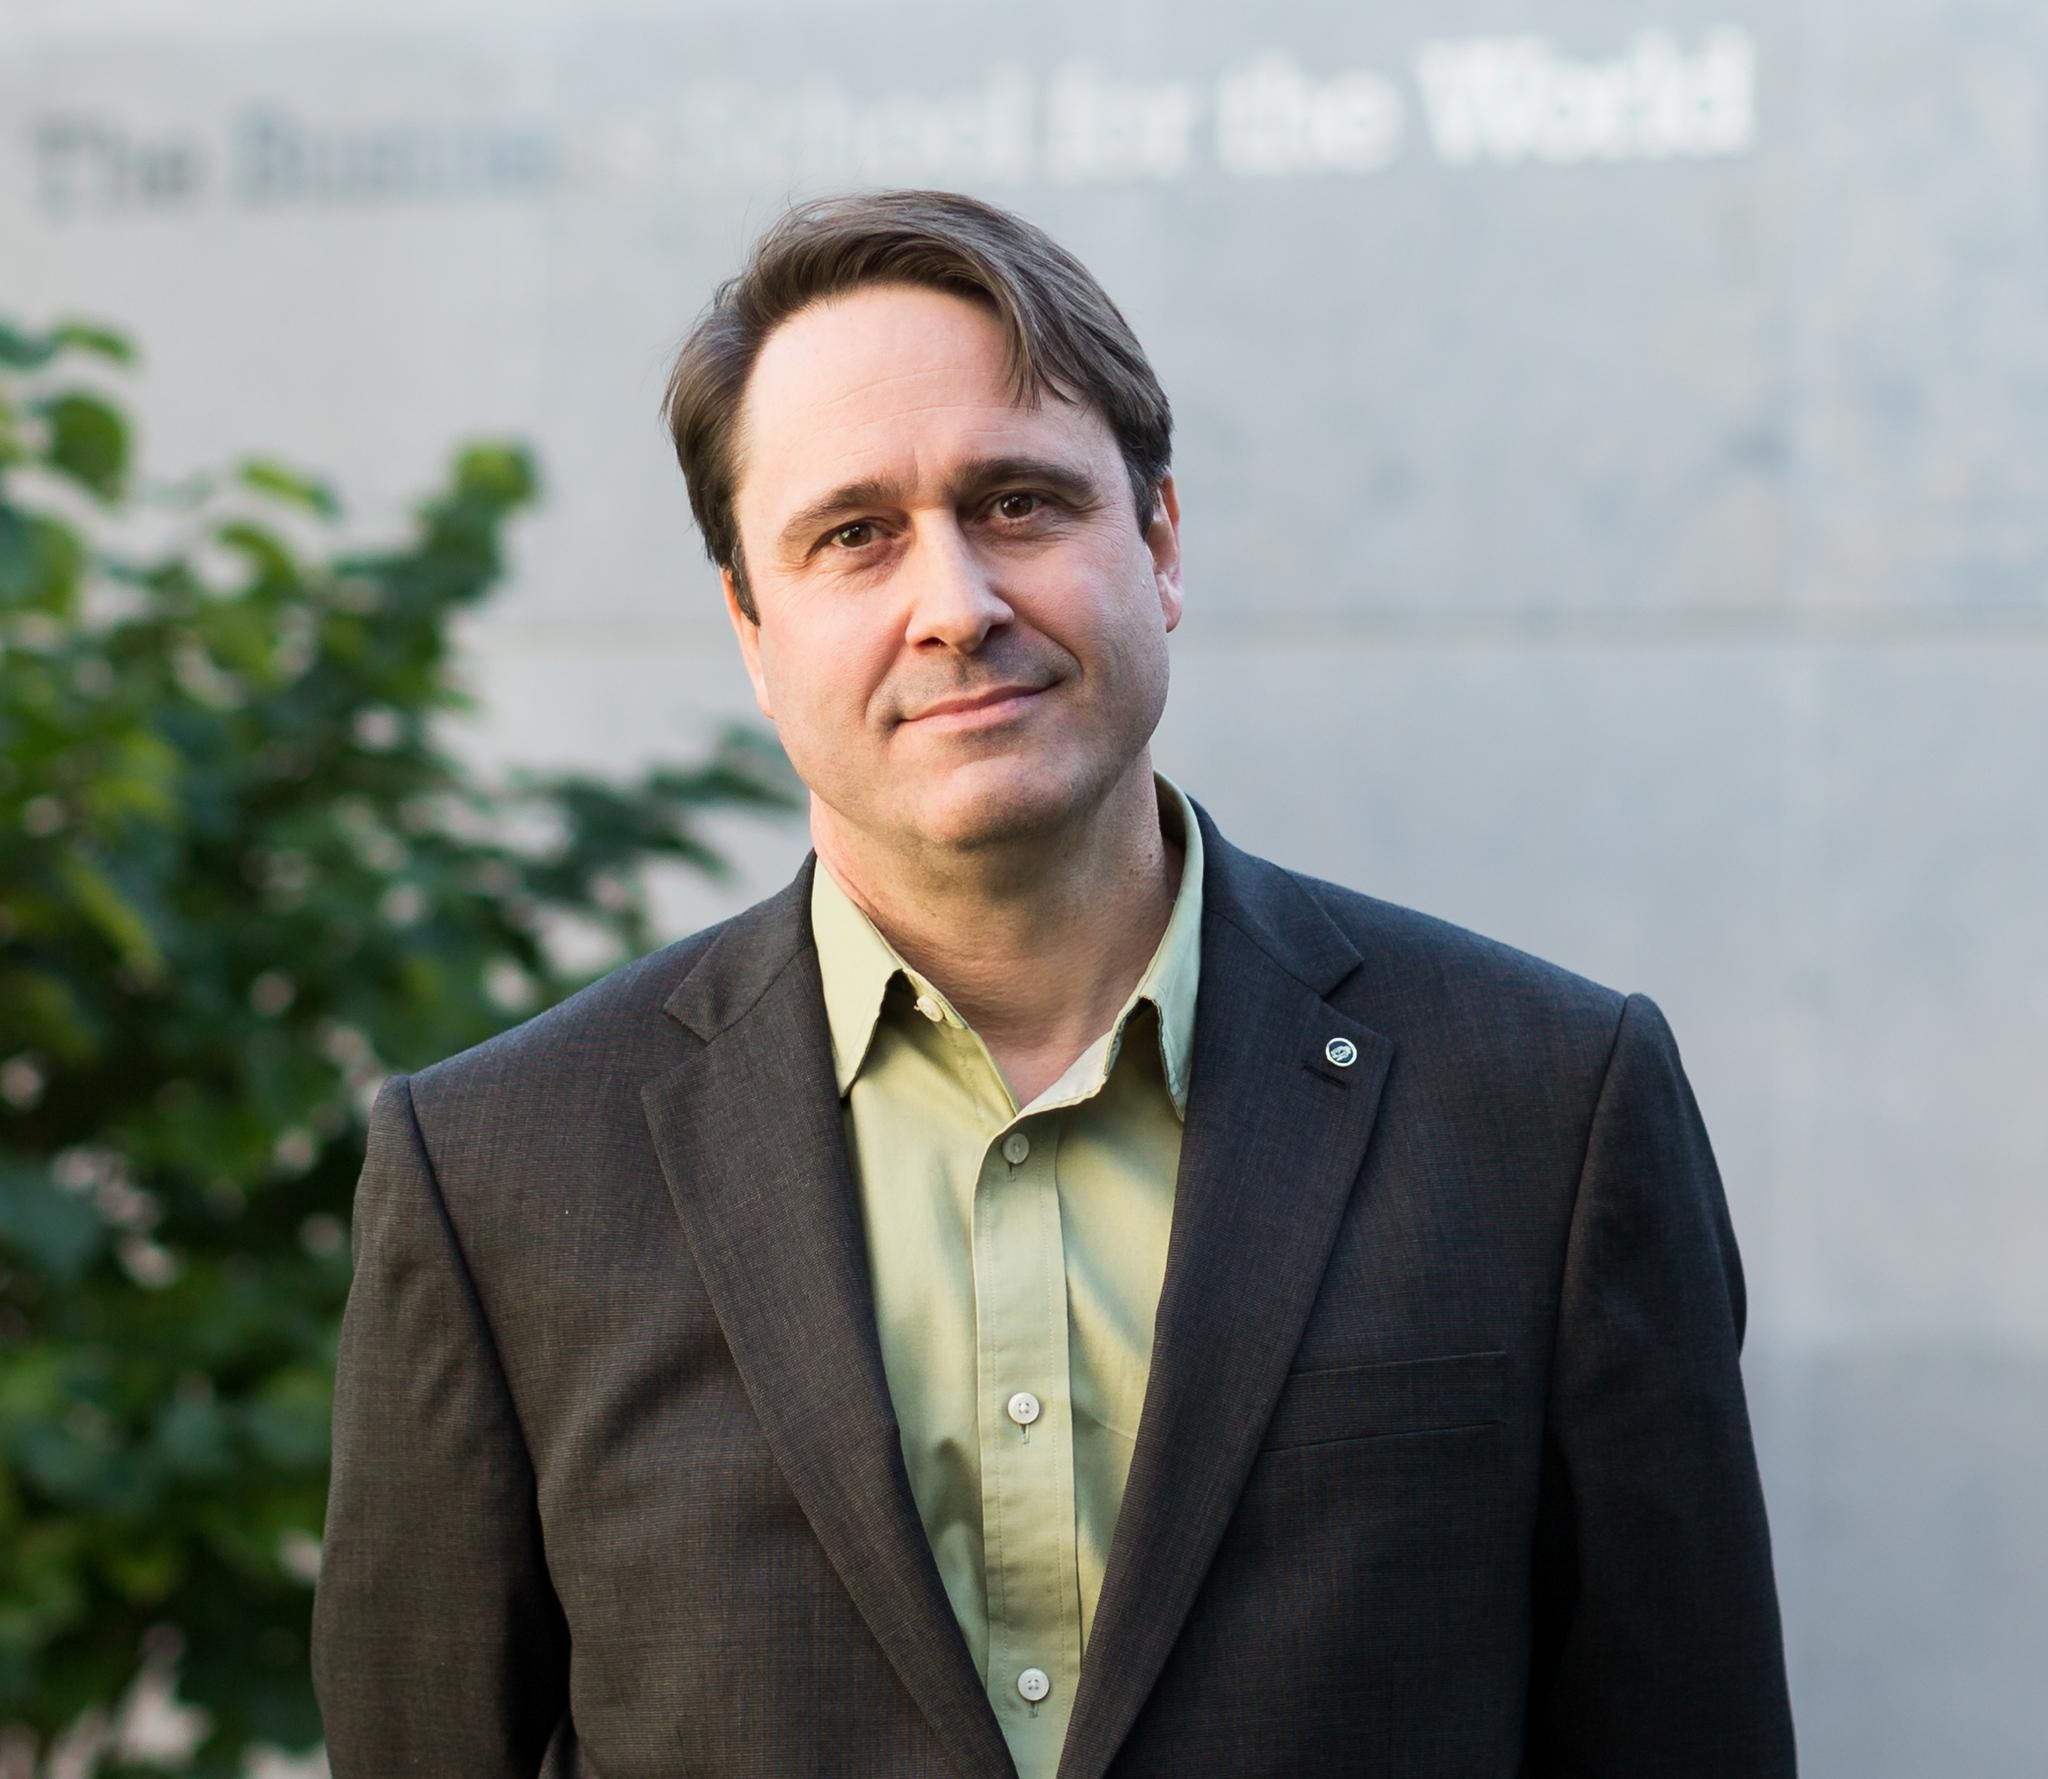 Peter Zemsky